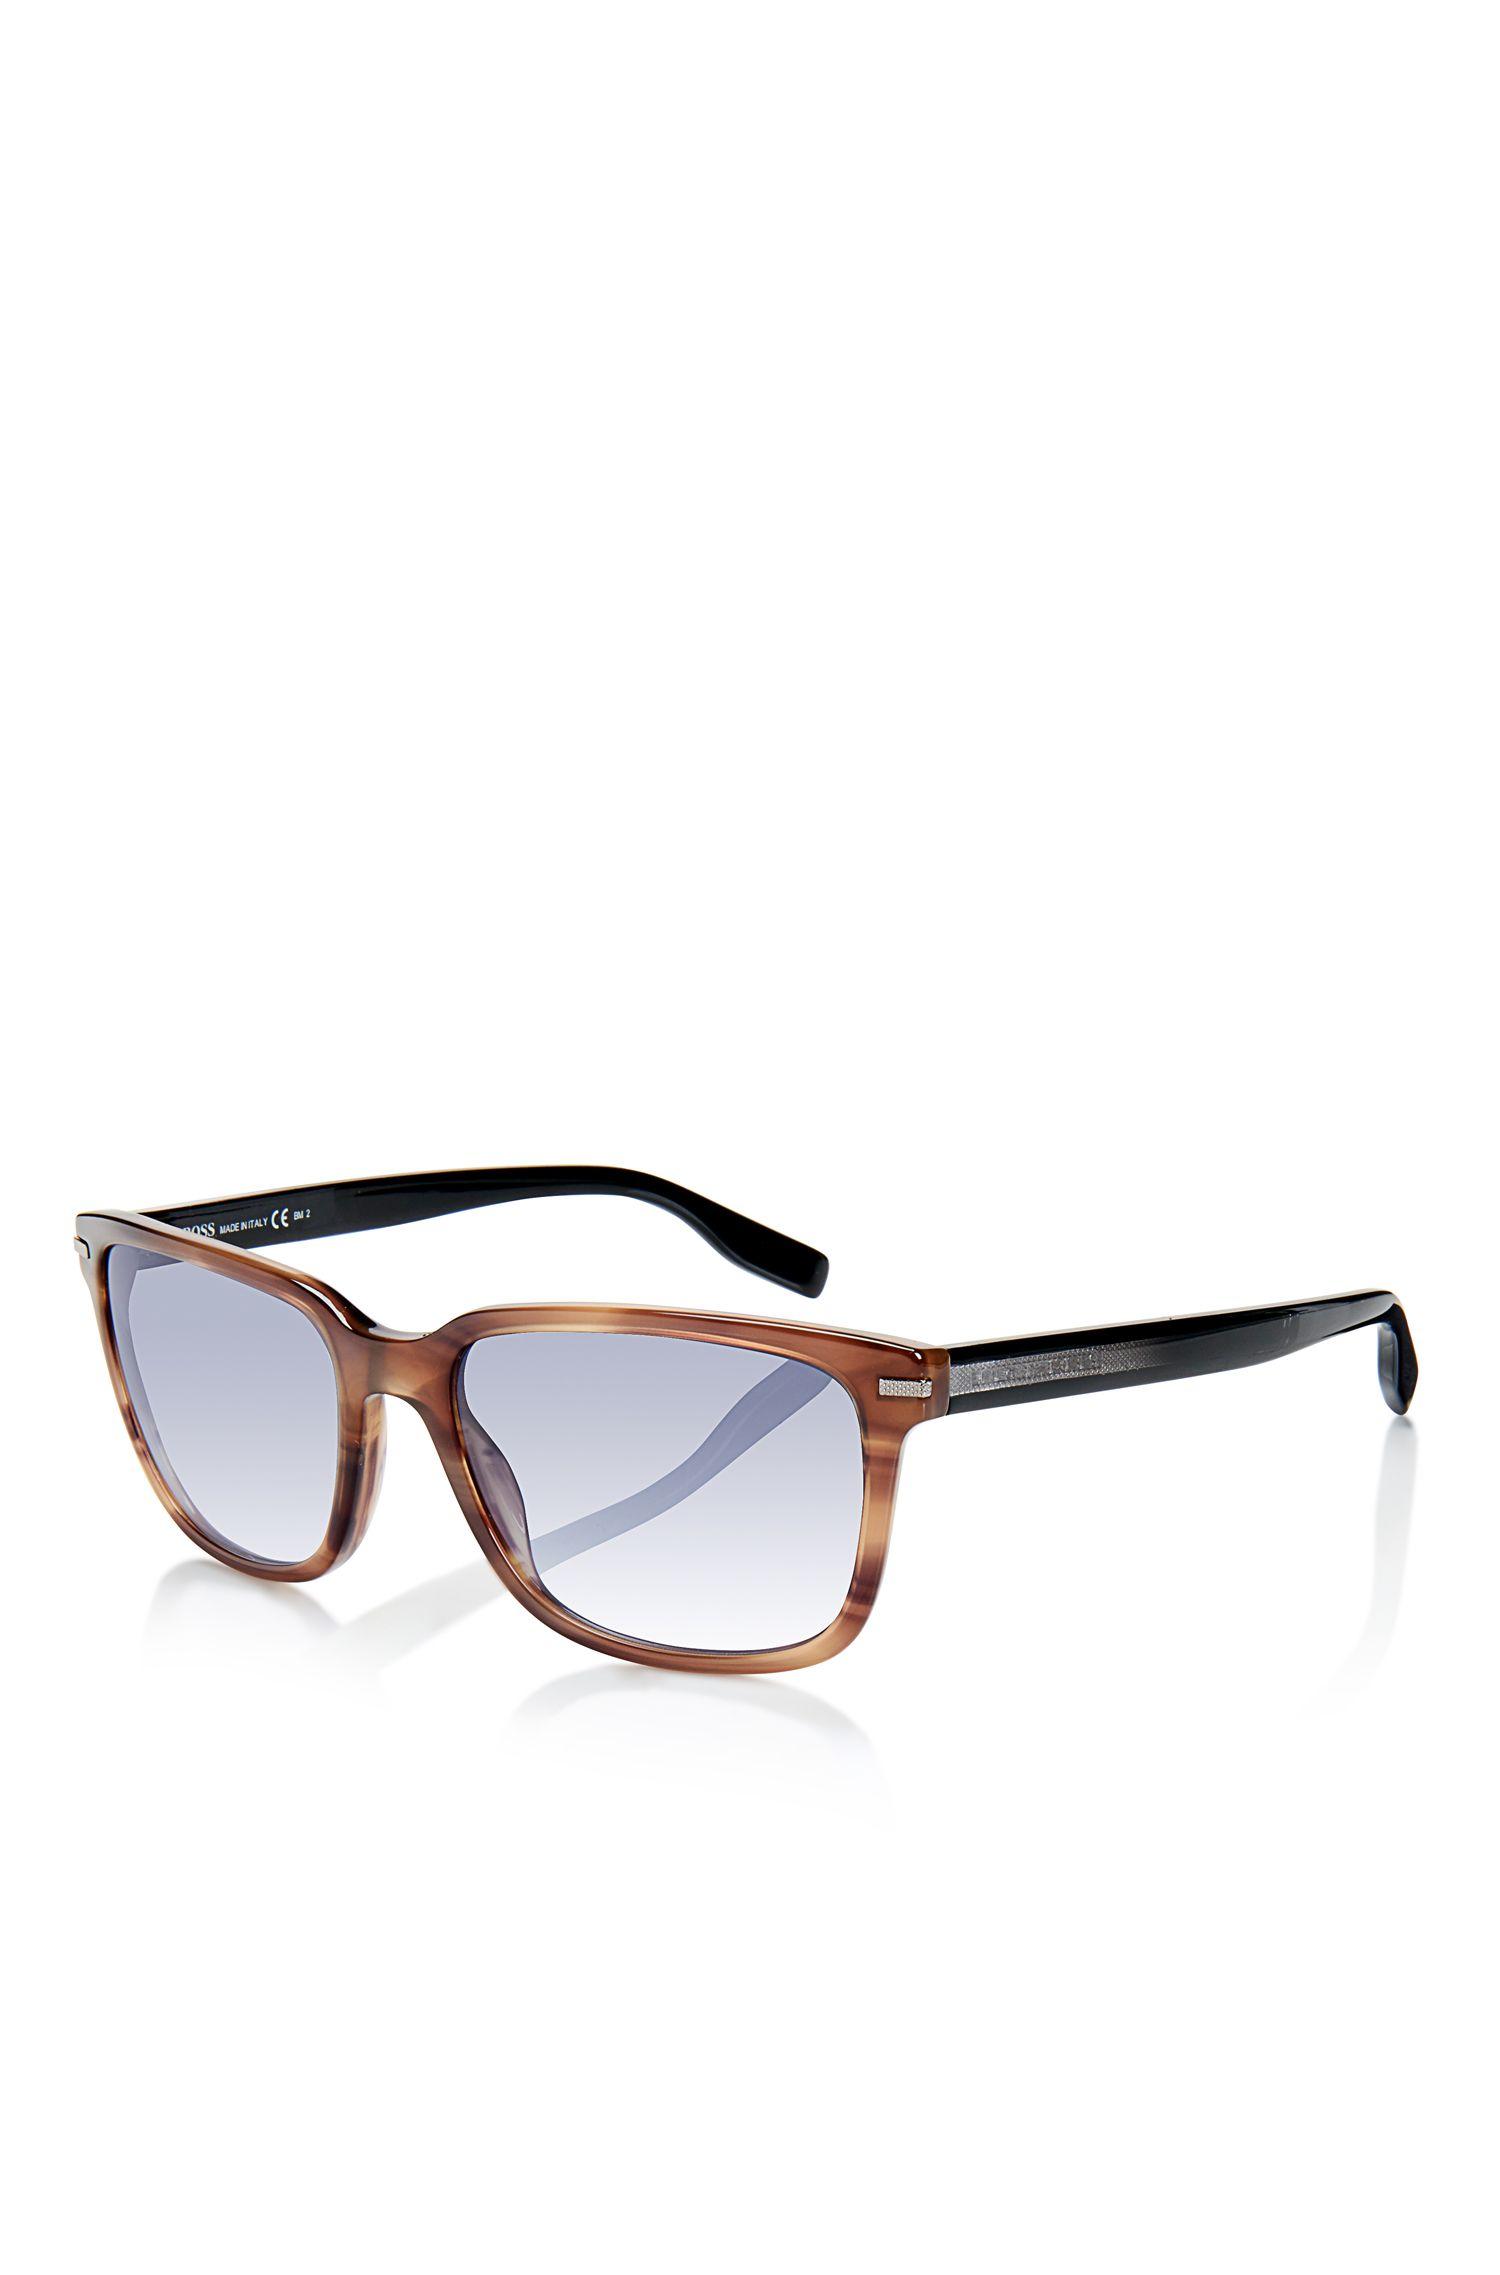 'Sunglasses'   Grey Gradient Lens Sunglasses